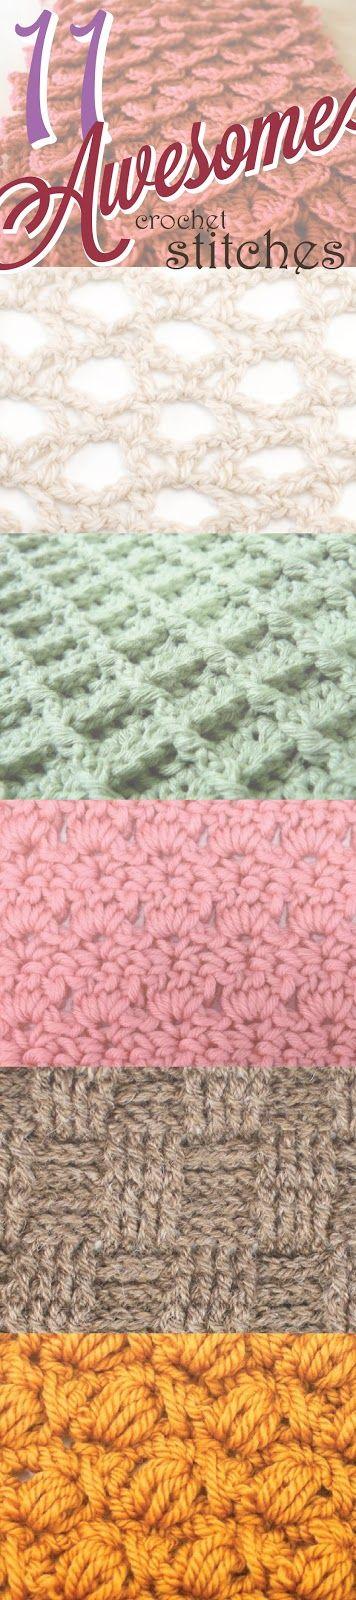 balenciaga shoes online shop  Micheal Nicholson on Knitting  Crocheting